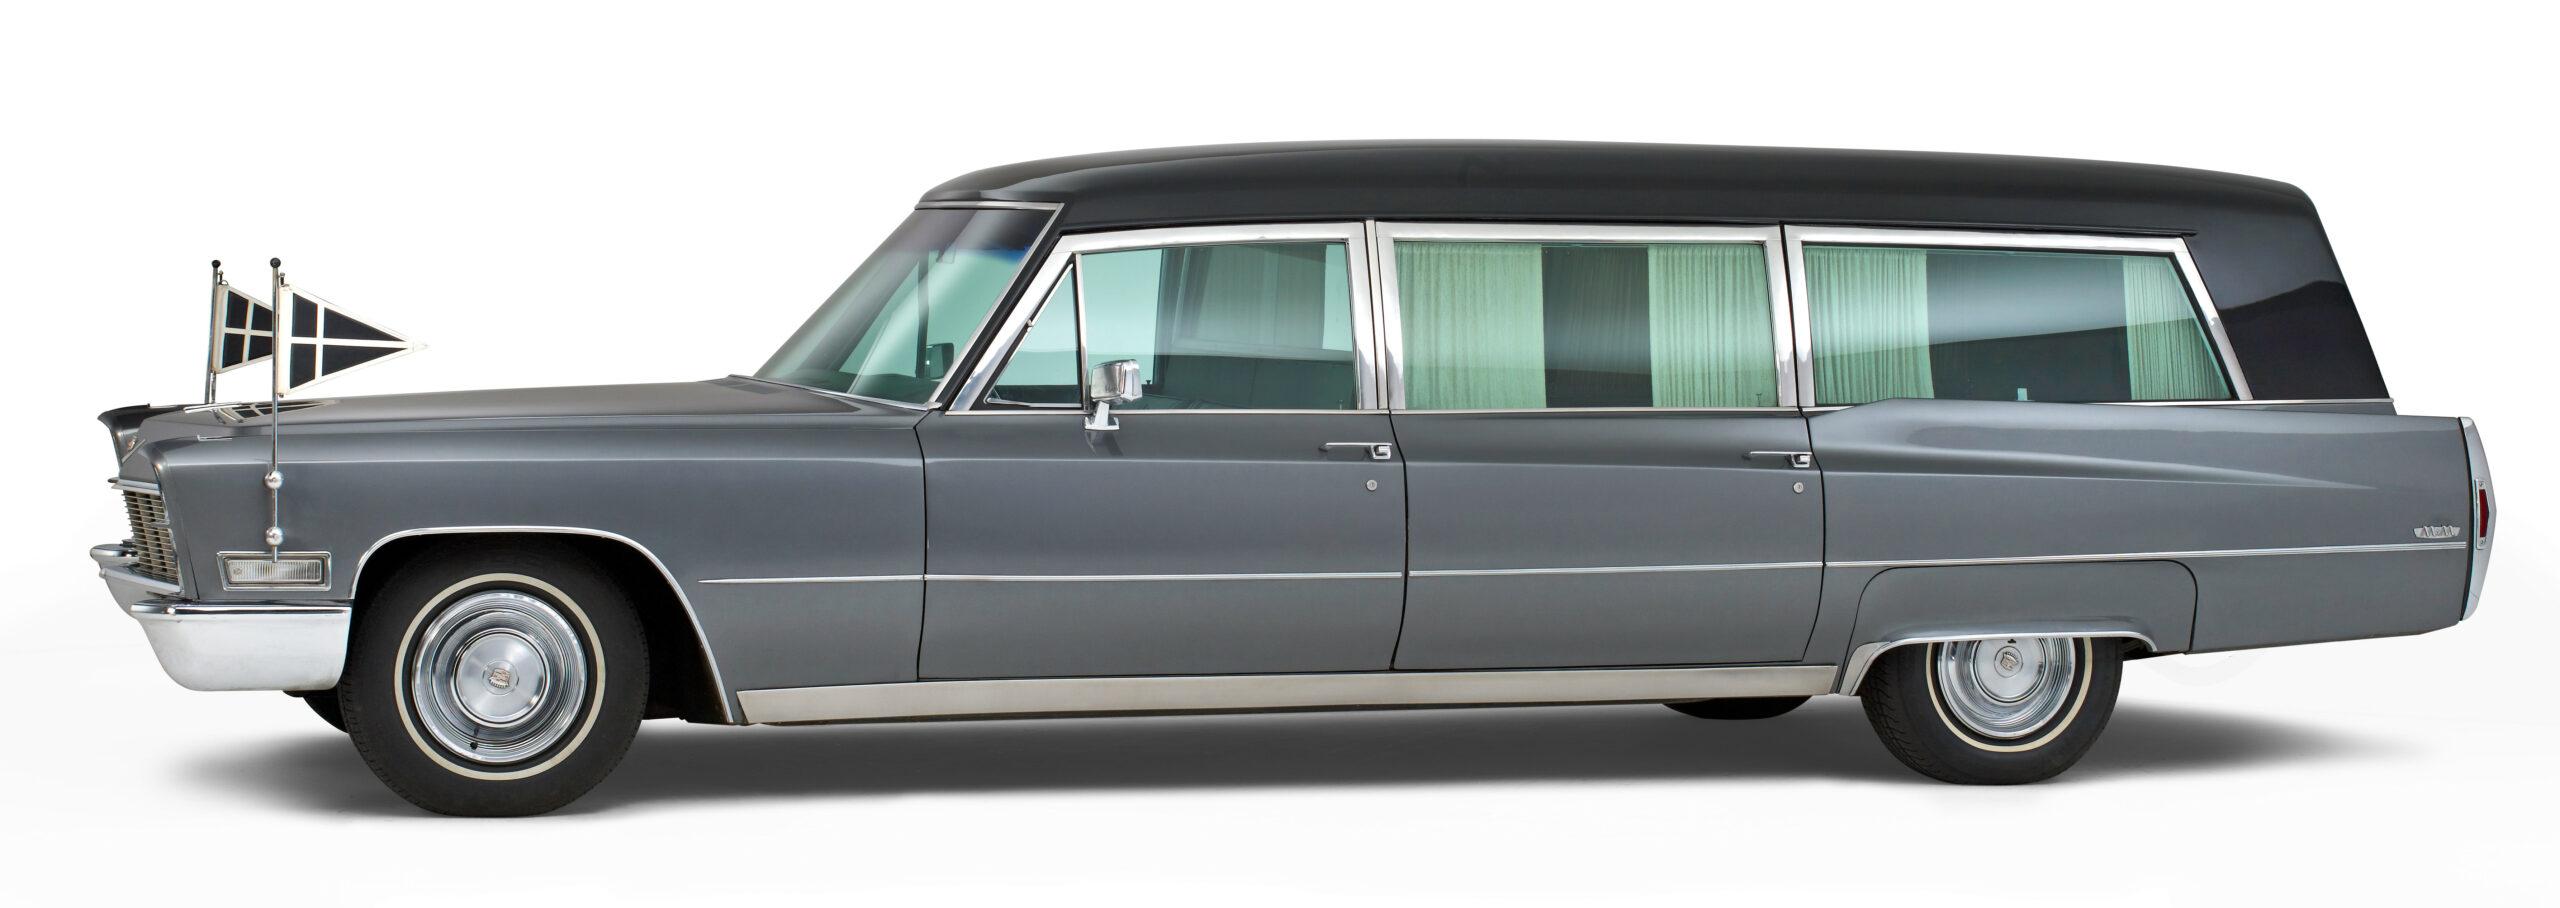 Cadillac oldtimer klassieke rouwauto